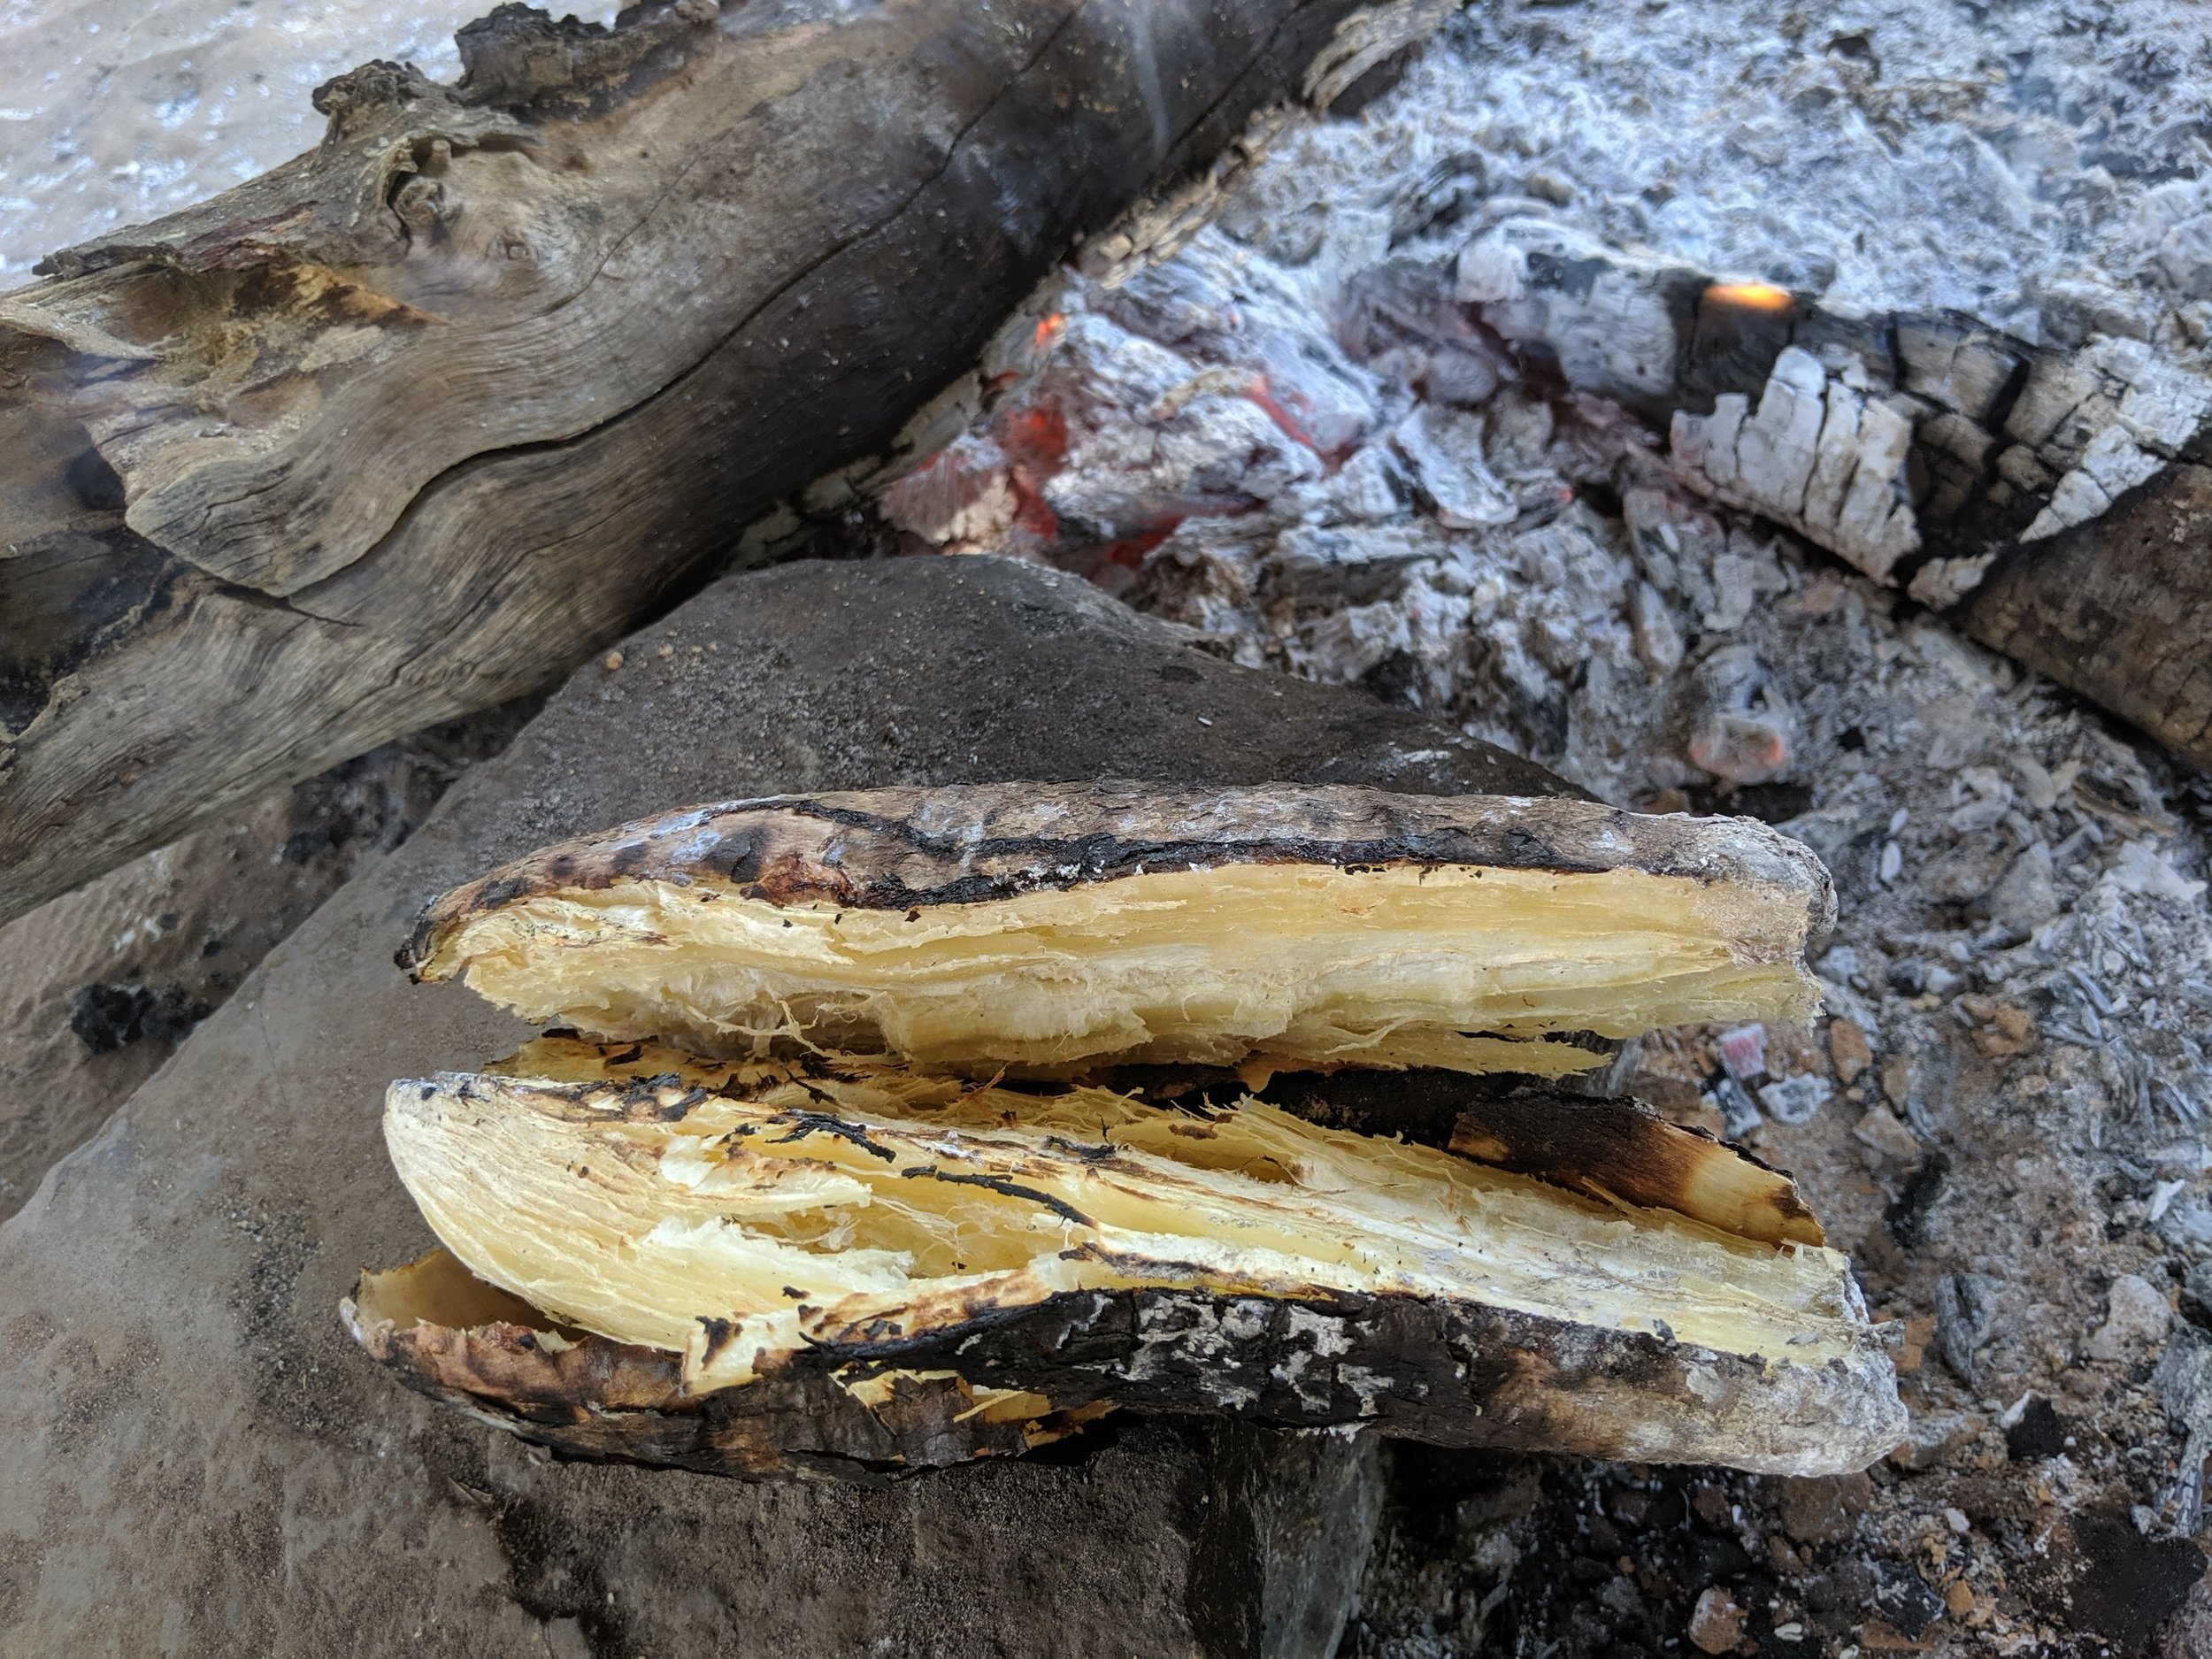 Inside of roasted cassava